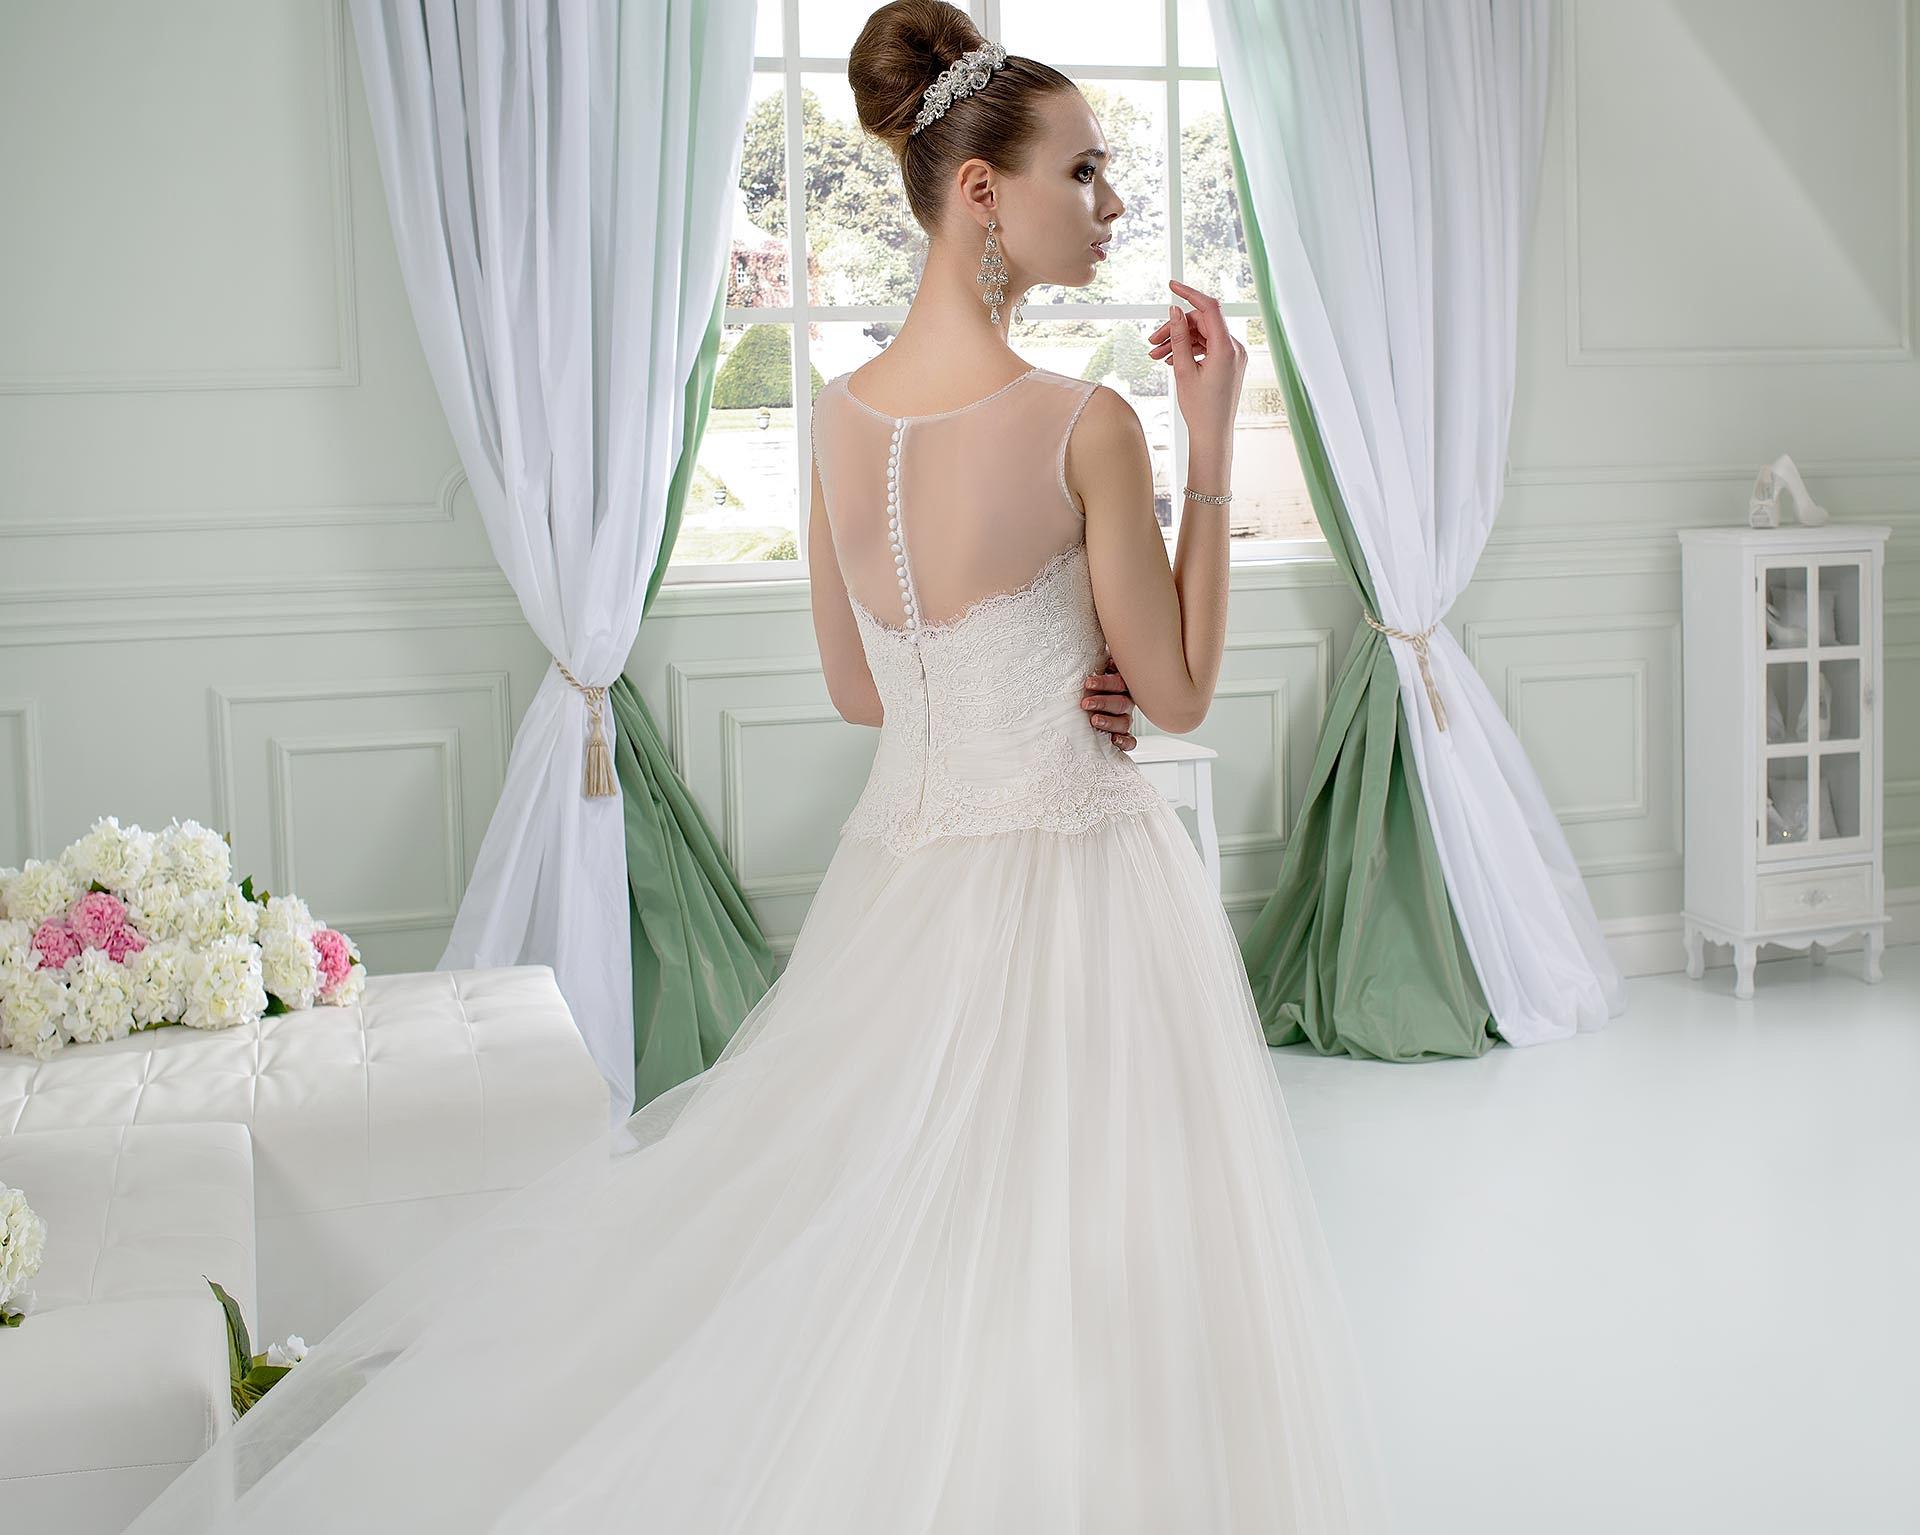 Robe de soiree pour mariage toulouse